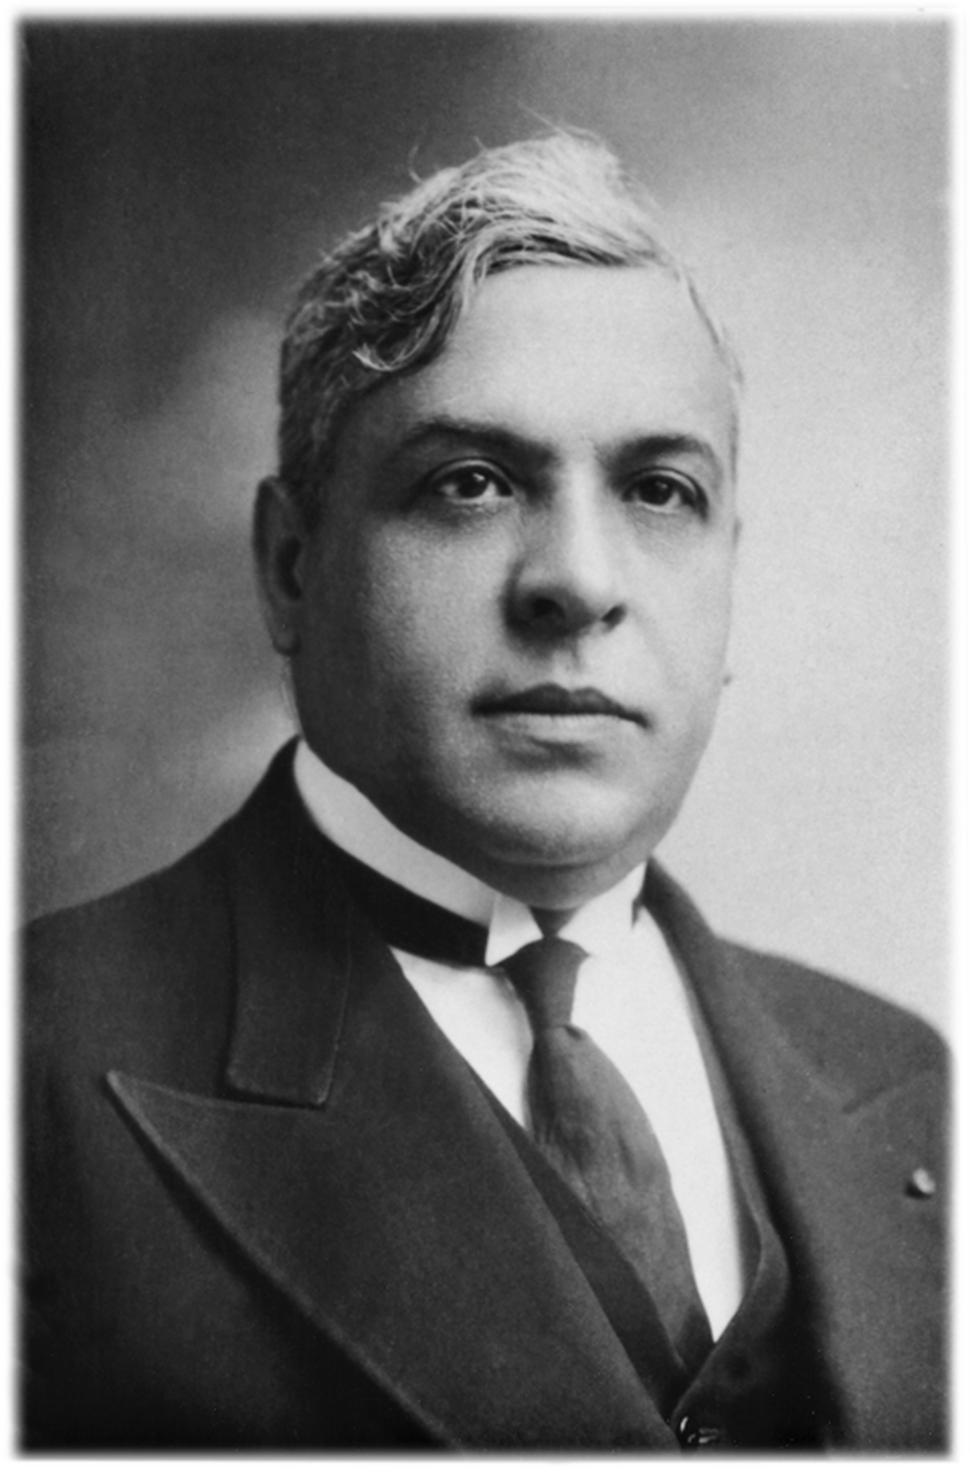 (Courtesy of the Sousa Mendes Foundation) Portuguese Consul General Aristides de Sousa Mendes in 1940.